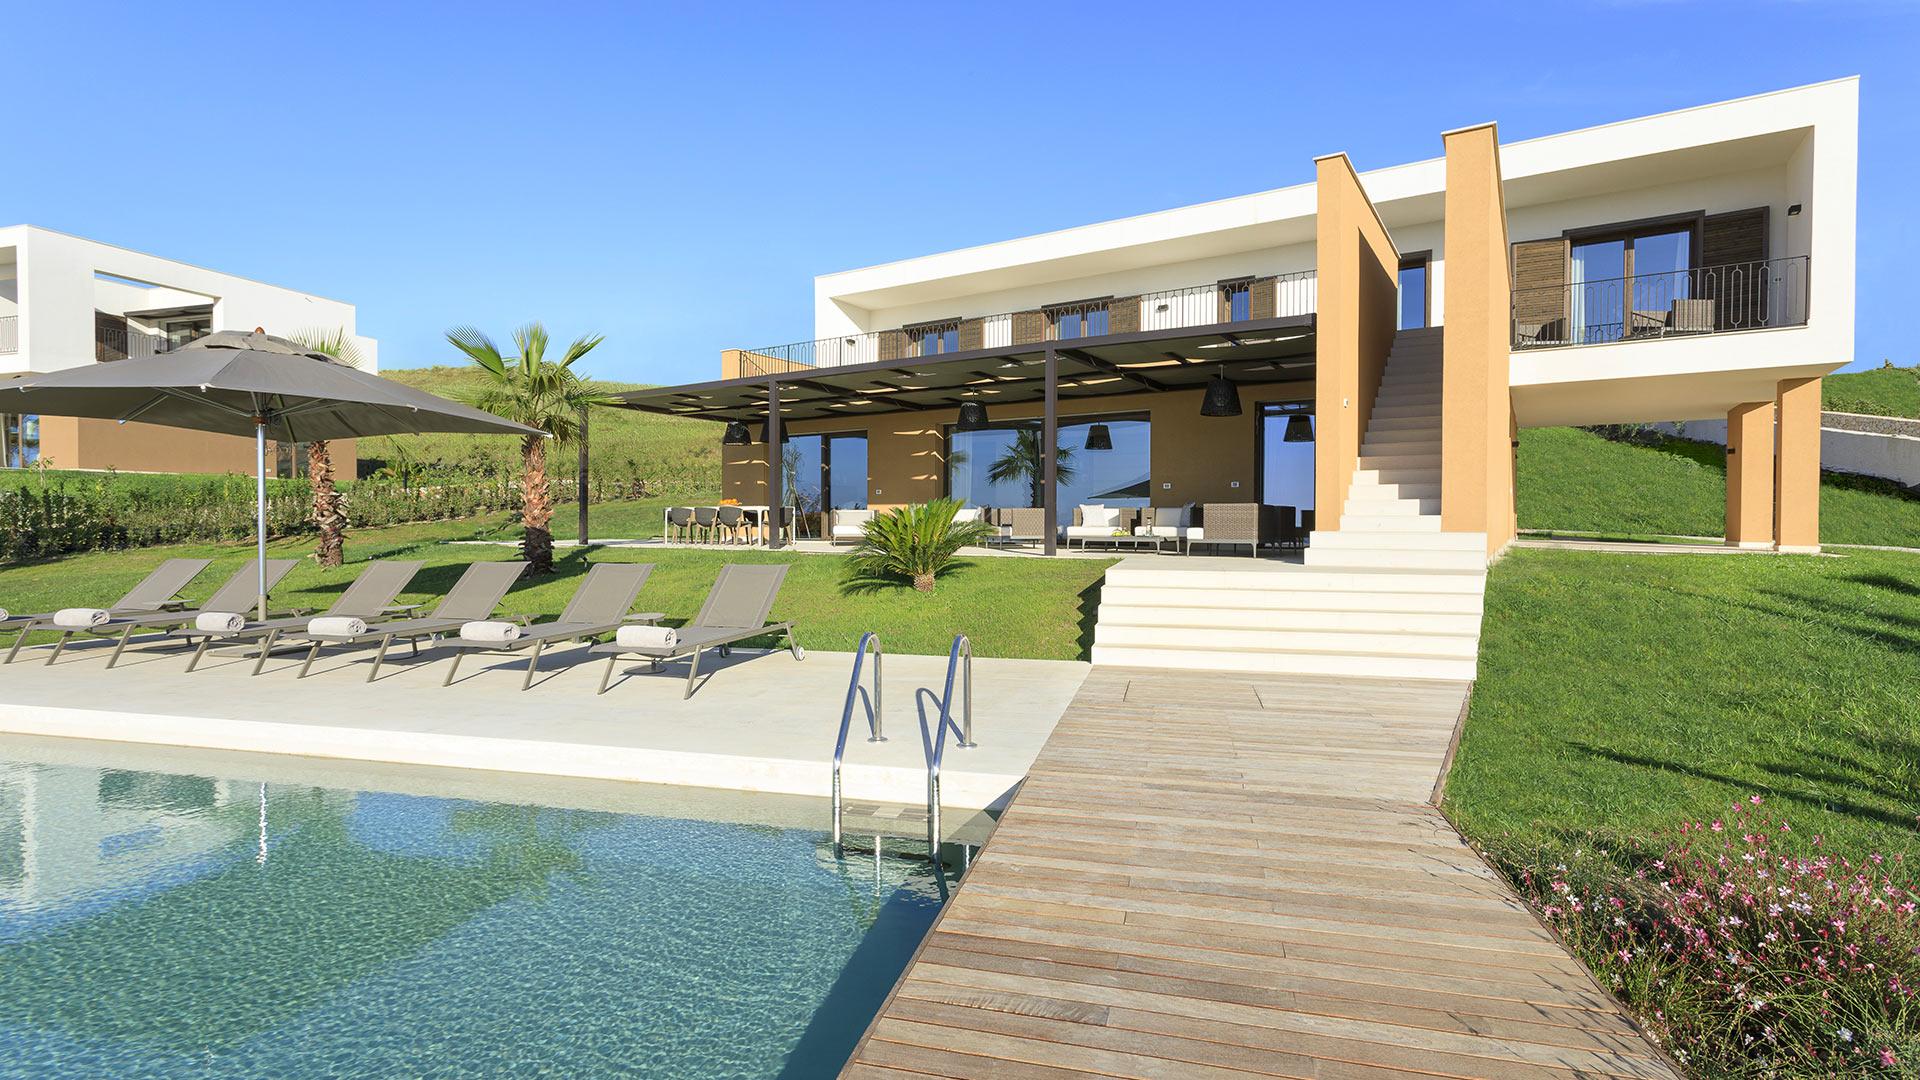 Villa Agata - Villa rental in Sicily, South West Sicily ...